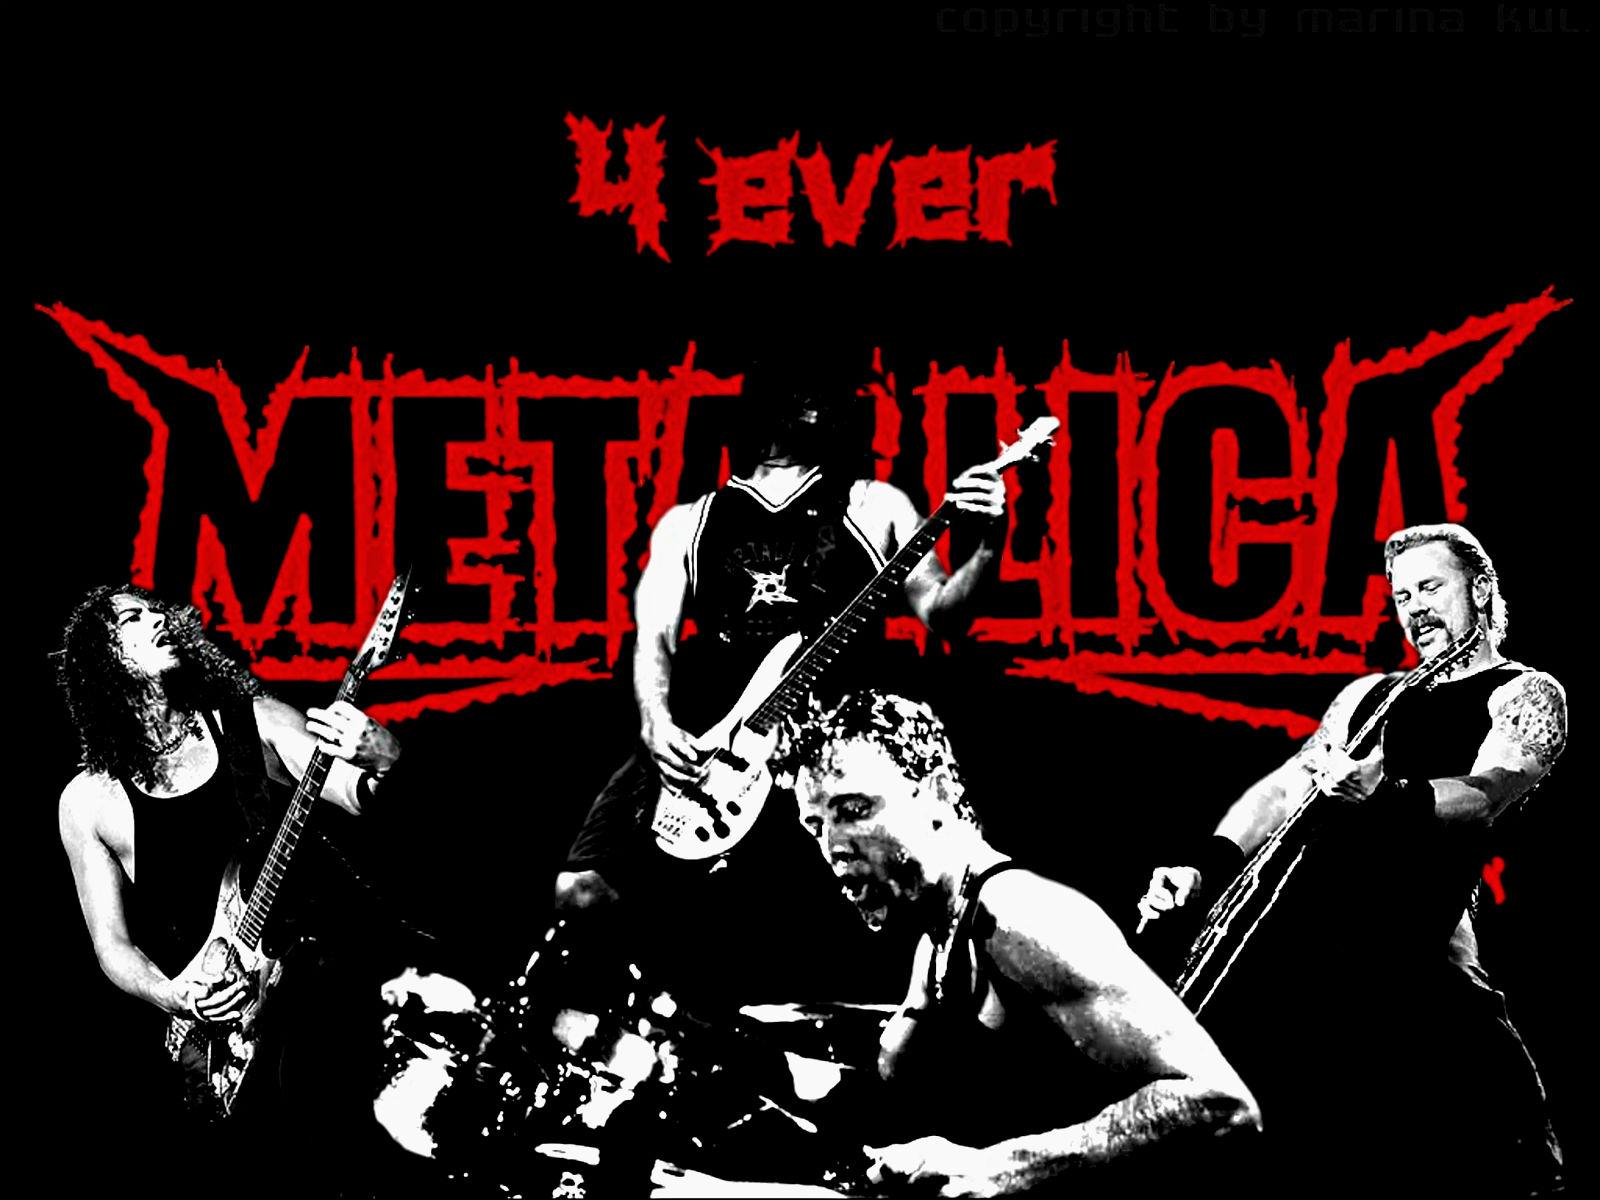 METALLICA thrash metal heavy album cover art f wallpaper ...